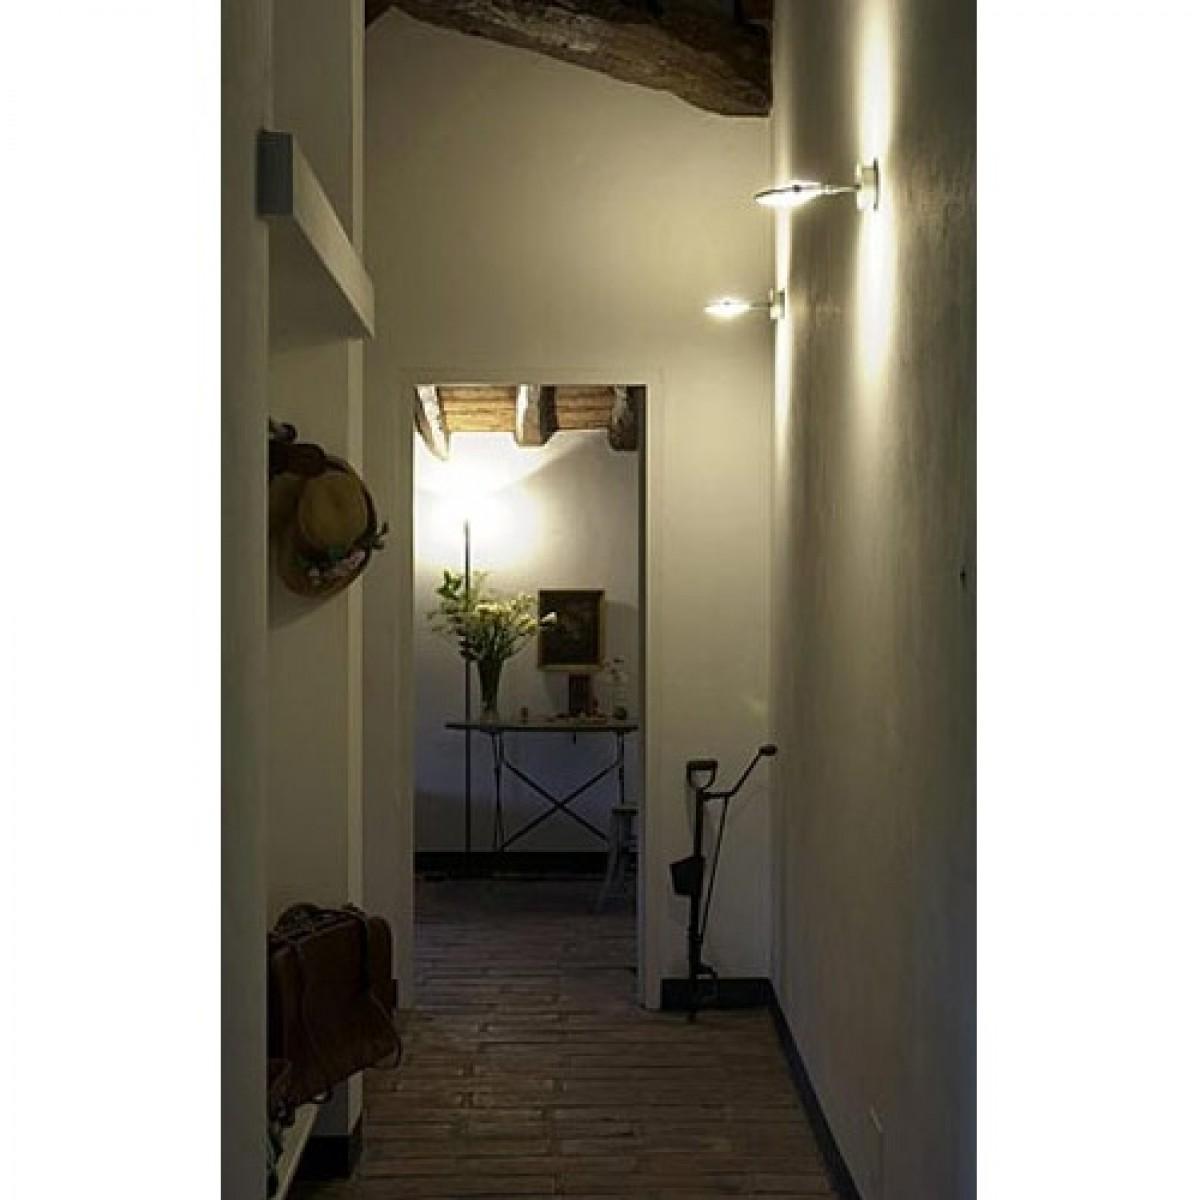 FontanaArte Nobi Wall Lamp Outlet | Desout.com